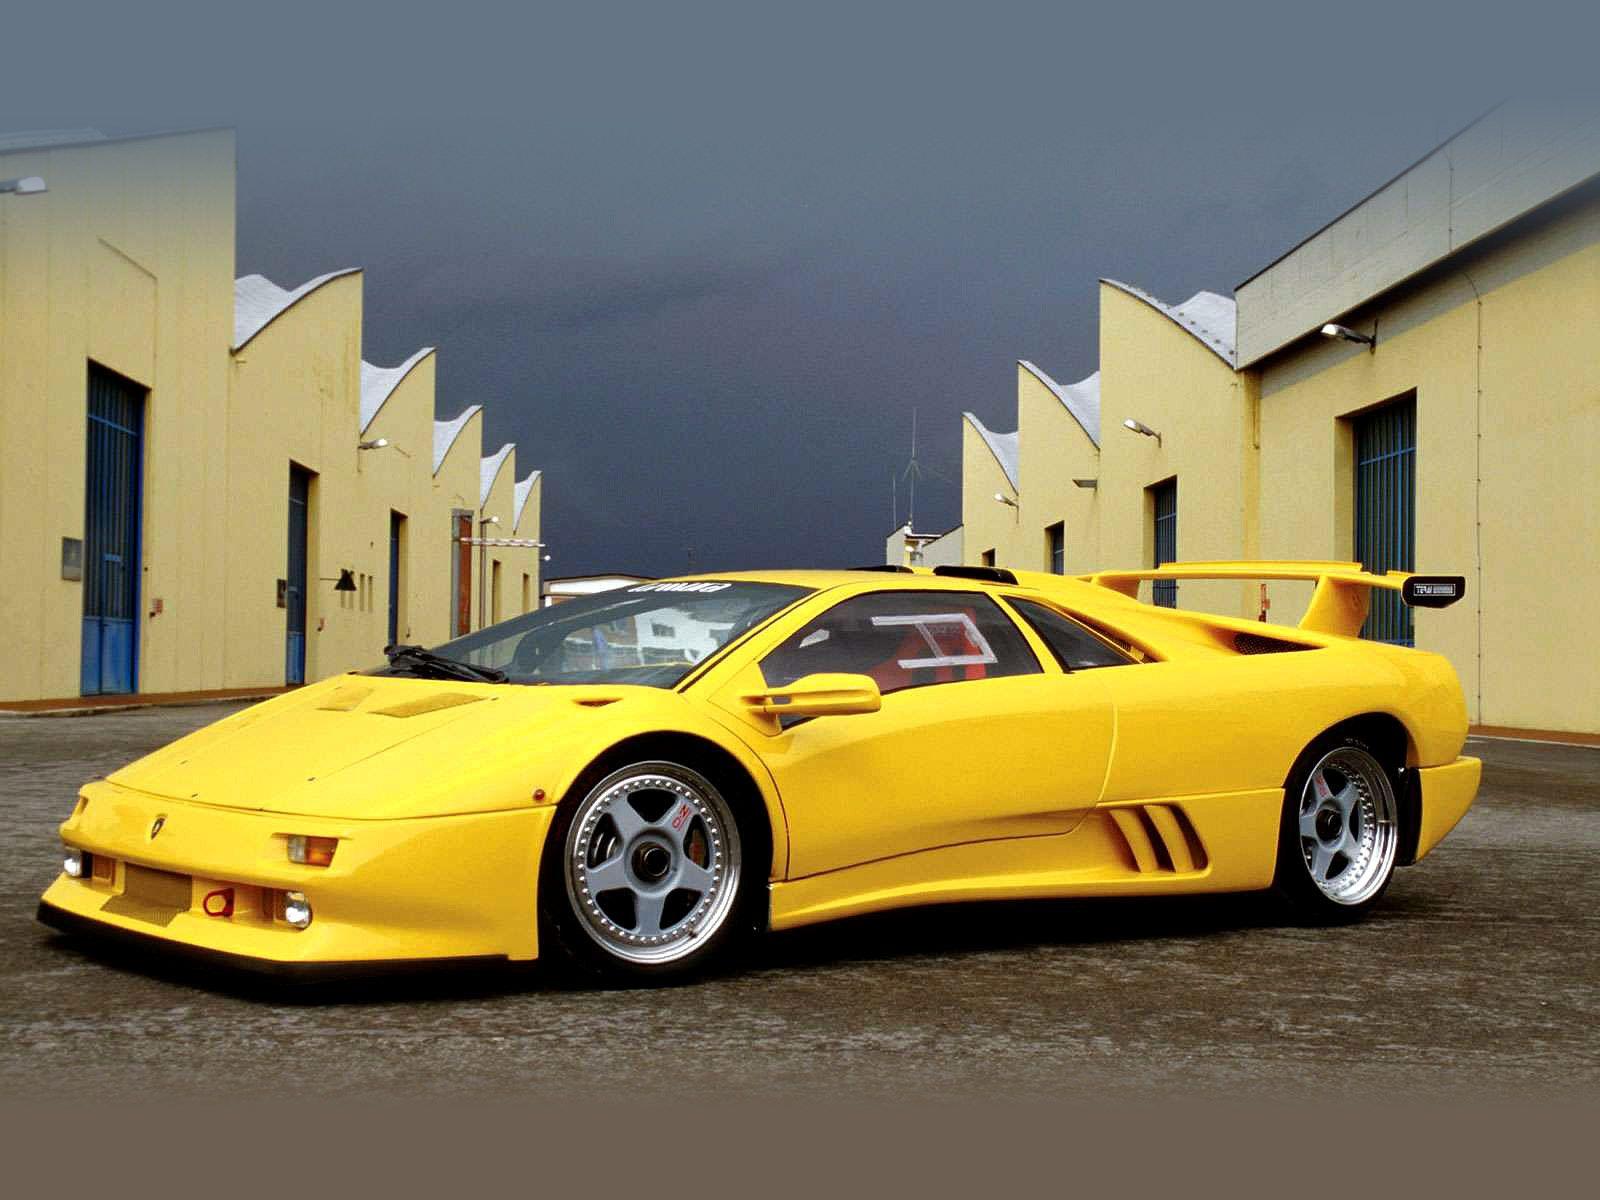 Lamborghini S Greatest Diablo 1990 Cars Lamborghini Cars